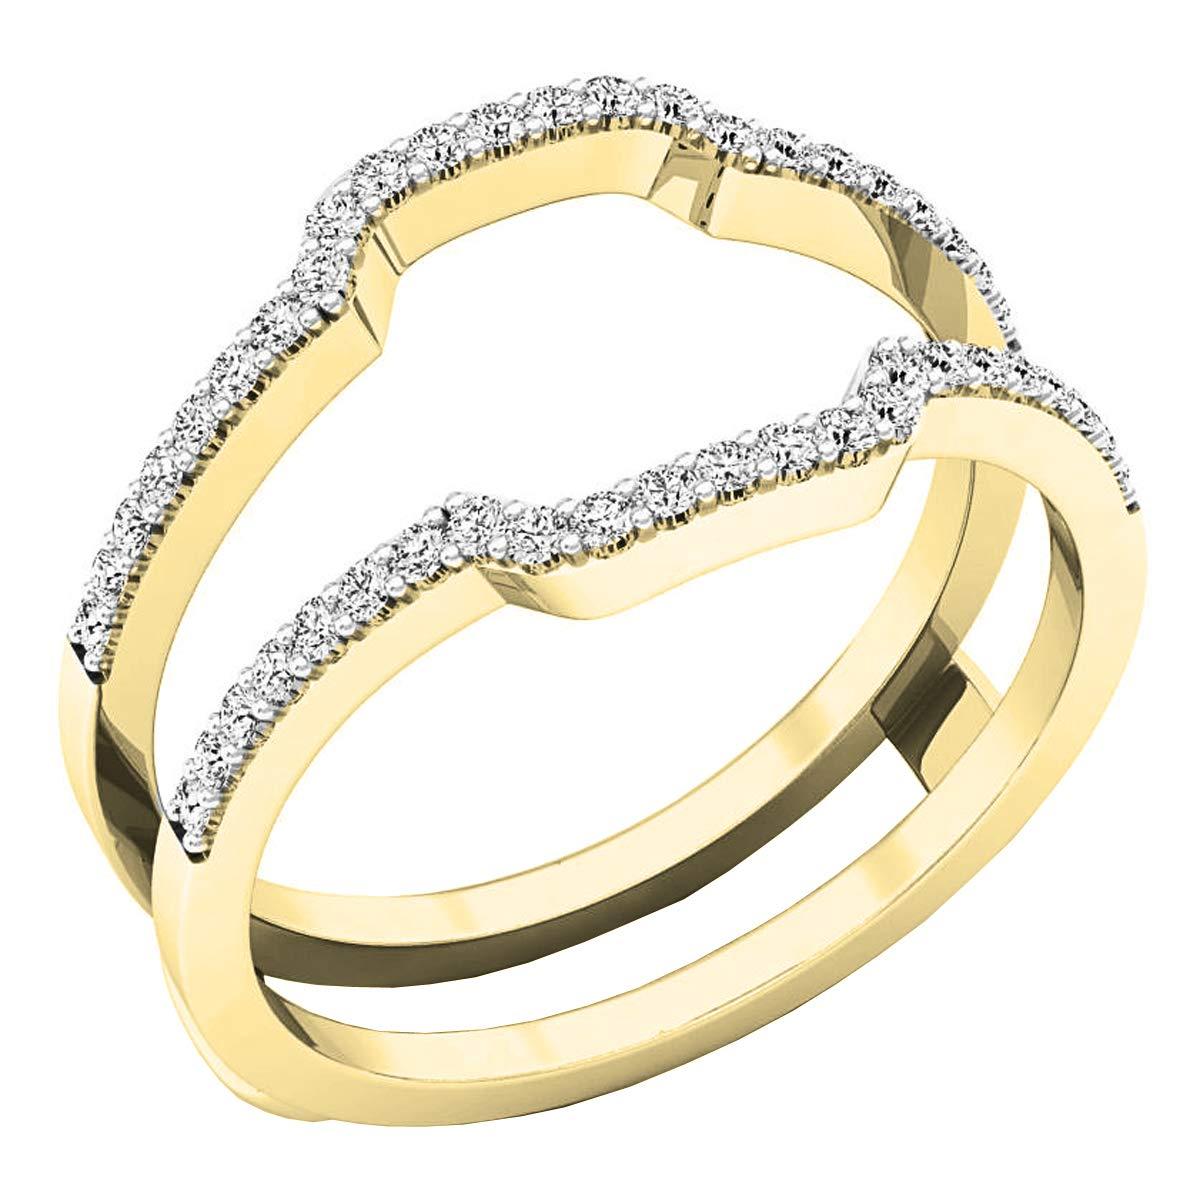 0.25 Carat (cttw) Round White Diamond Ladies Wedding Enhancer Guard Ring 1/4 CT, 10K Yellow Gold, Size 5 by Dazzlingrock Collection